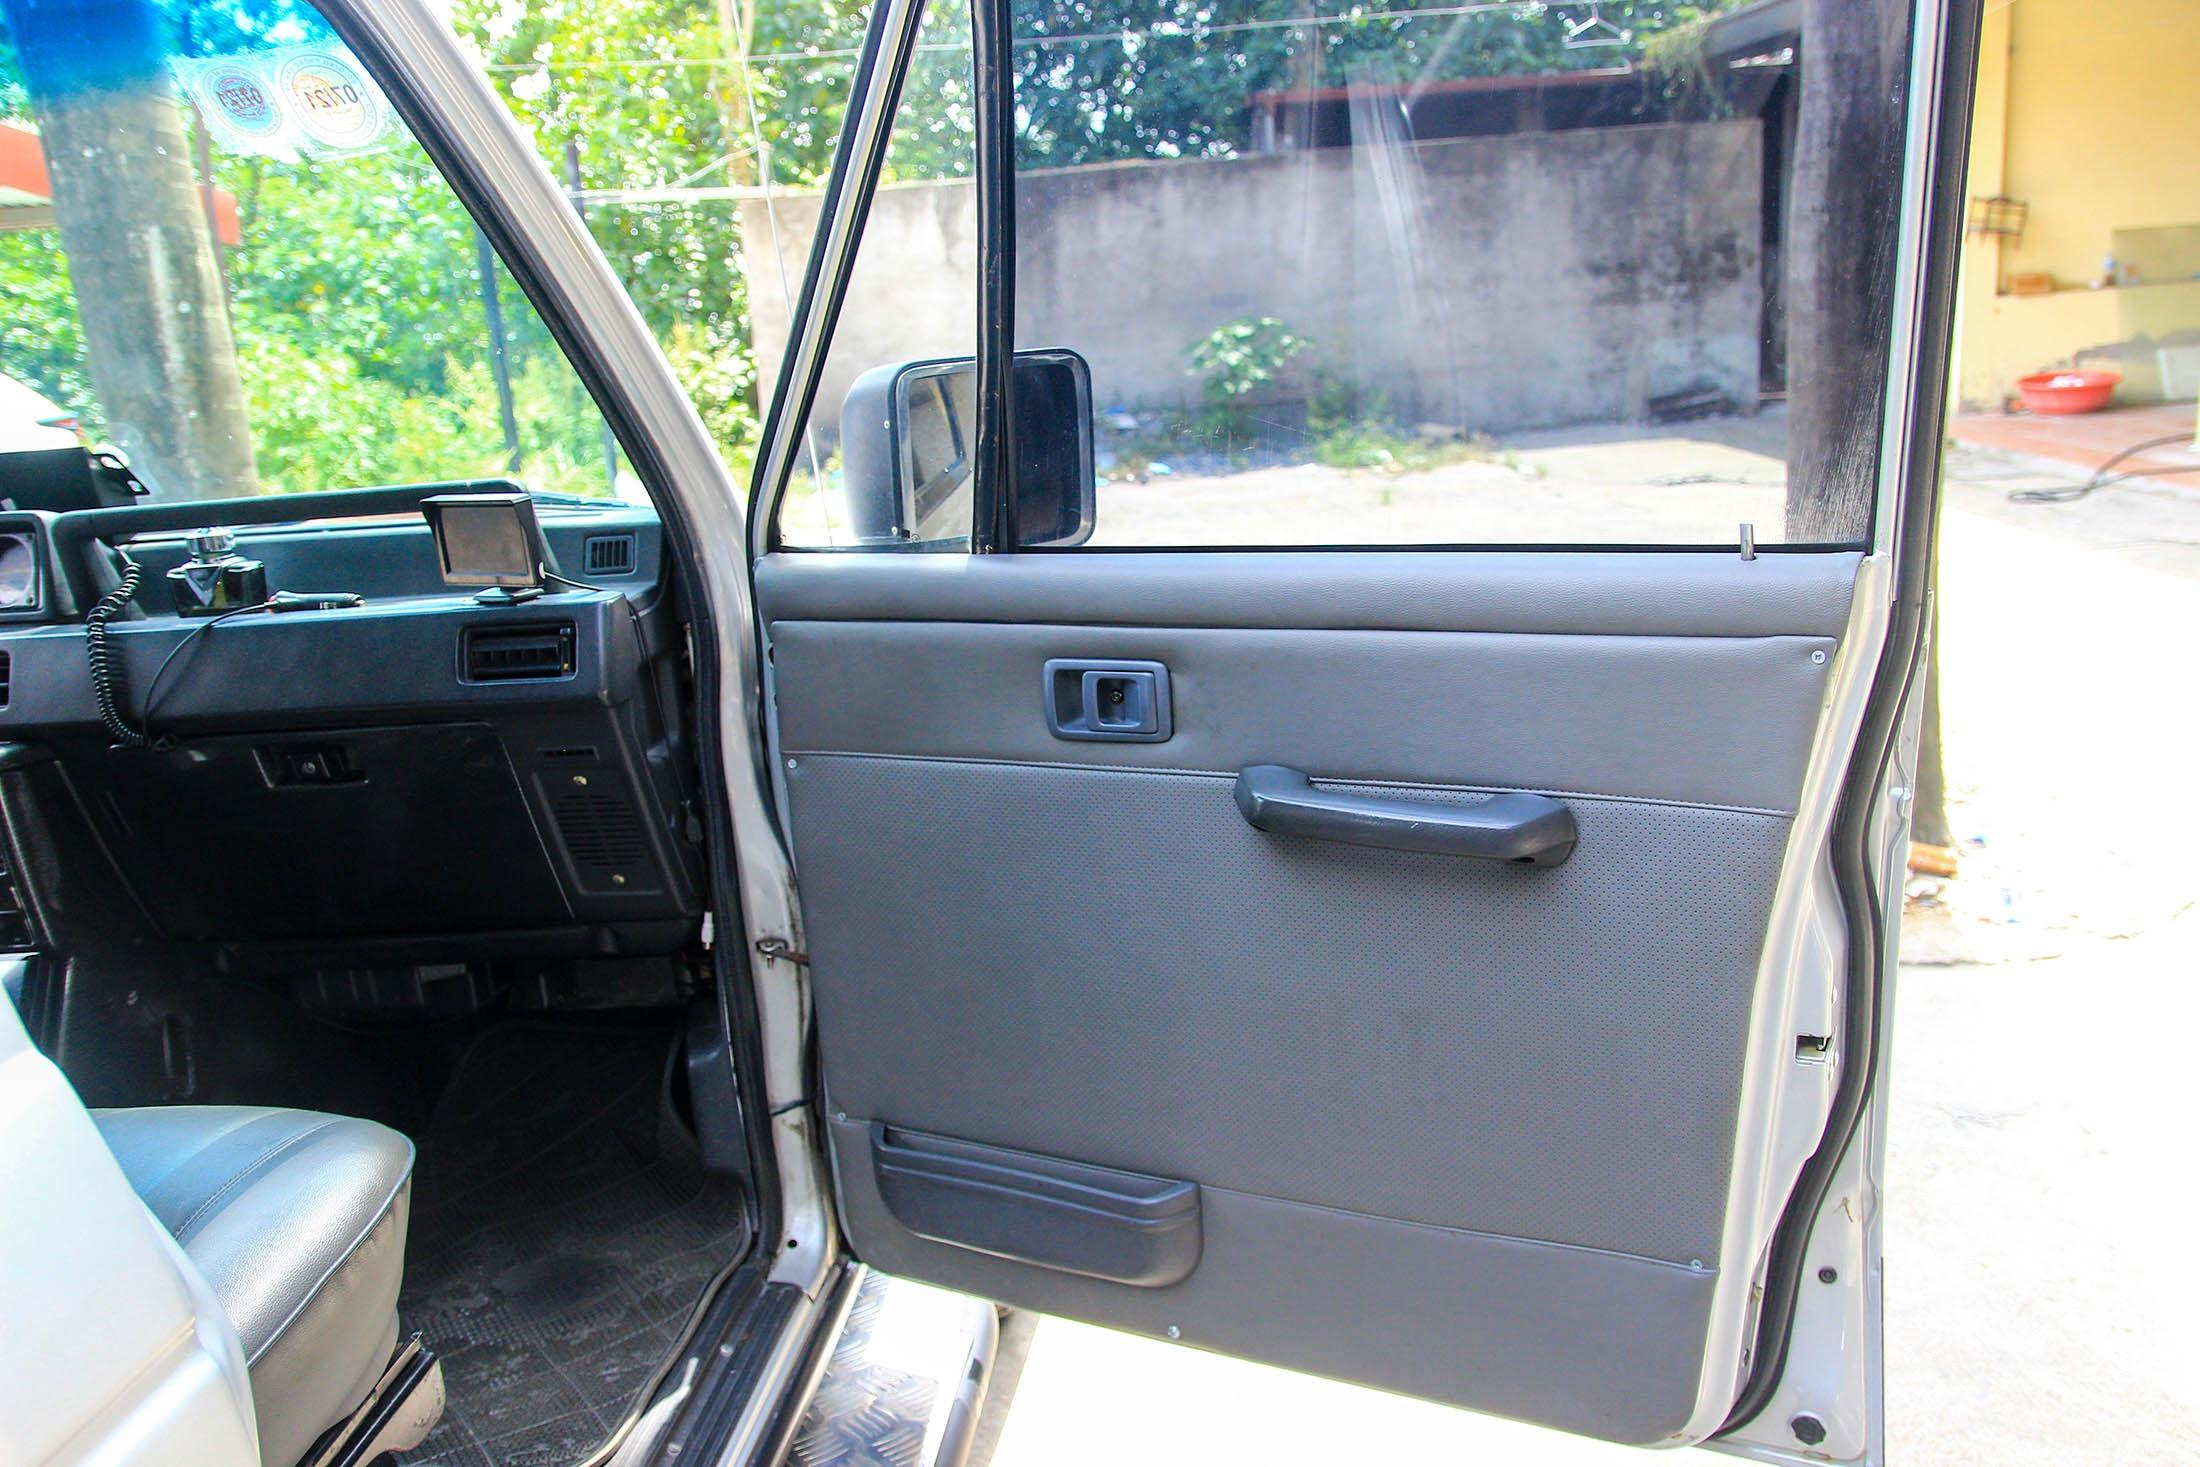 Chi tiết Dodge Raider - xe cổ hiếm gặp tại Việt Nam Ảnh 11